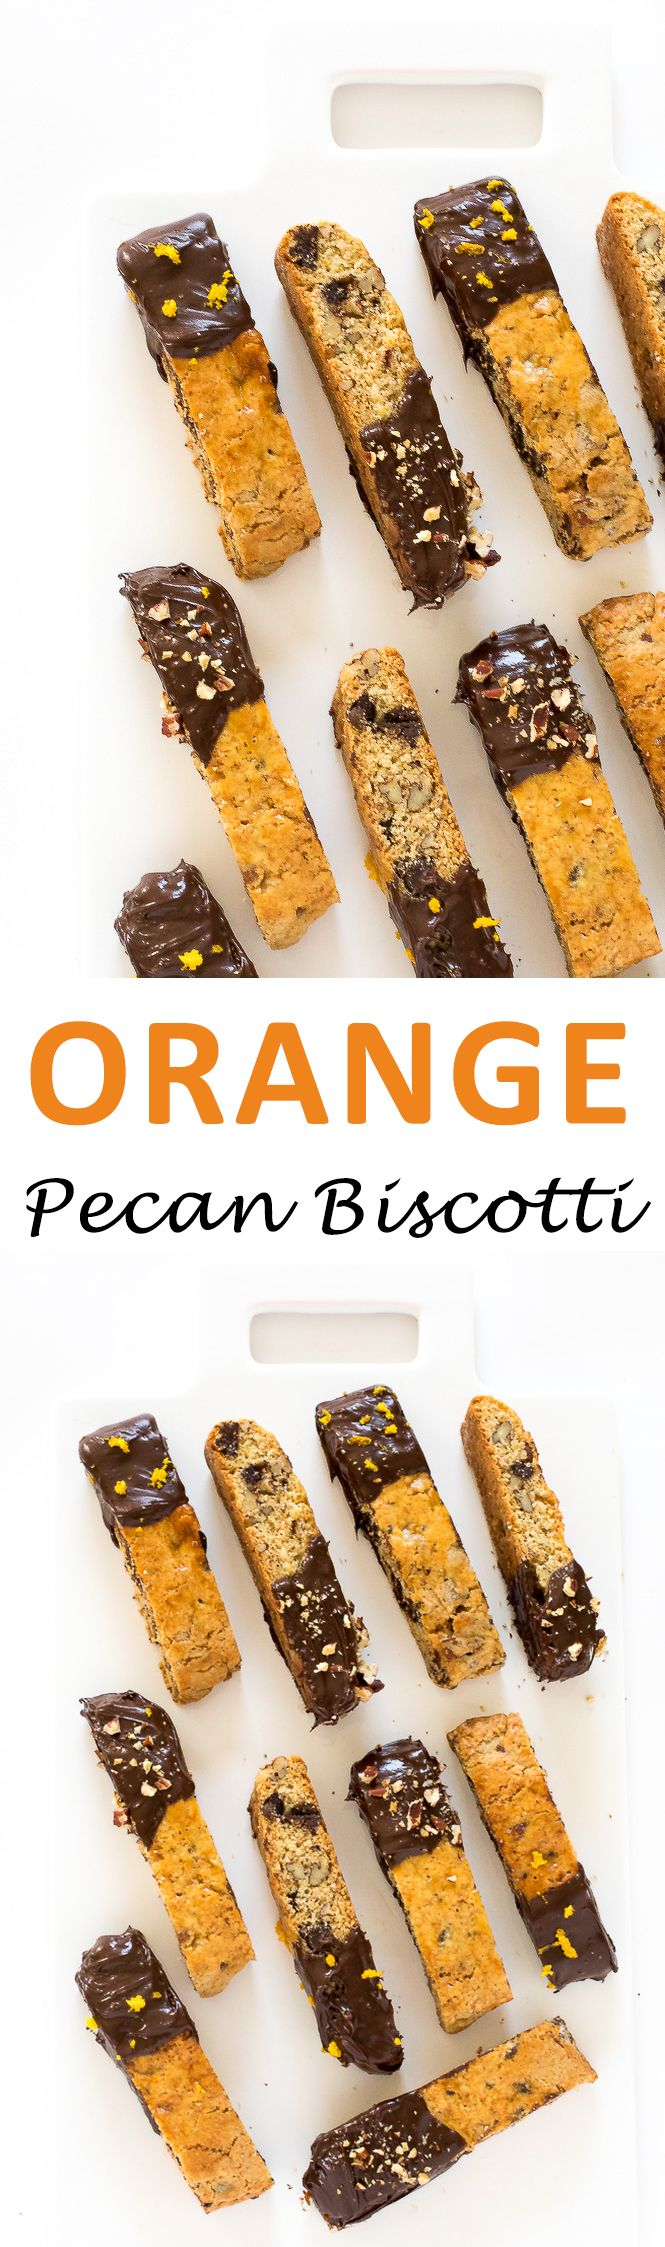 Orange Chocolate Chip Biscotti. Crisp biscotti dipped in chocolate then sprinkled with orange zest! | chefsavvy.com #recipe #food #dessert #pecan #biscotti